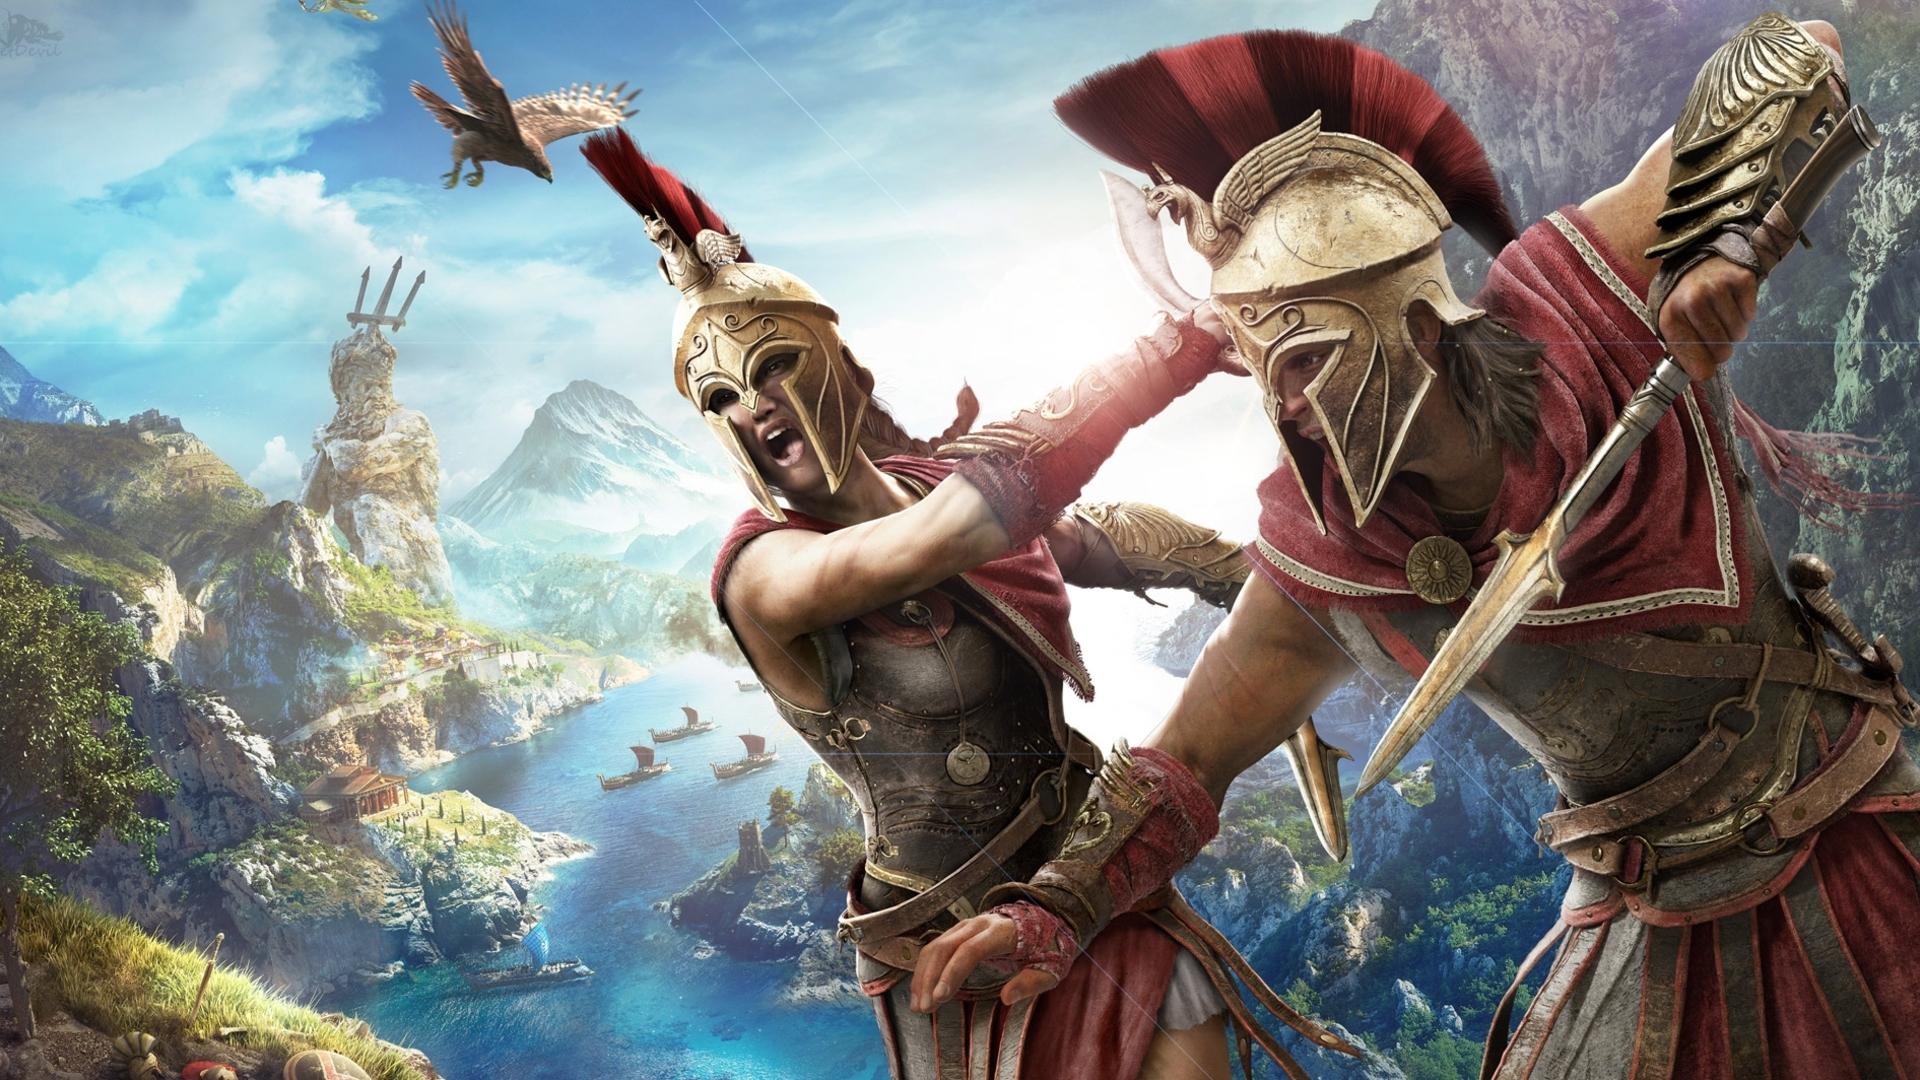 Ubisoft assassin's creed odyssey vs Origins